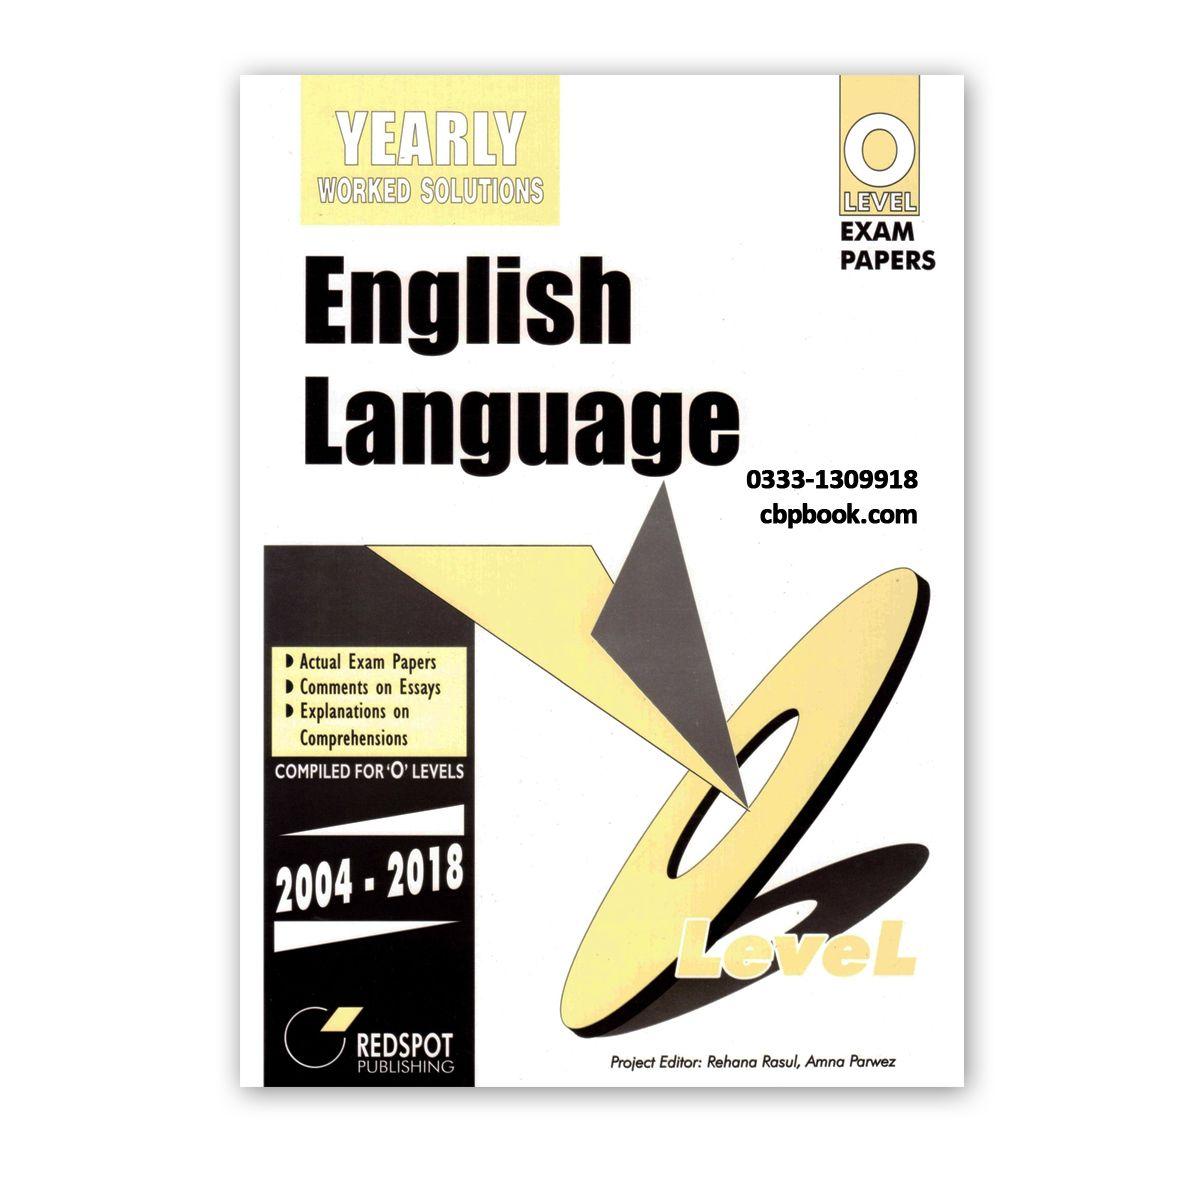 O Level ENGLISH LANGUAGE Yearly Solution 2019 Edition